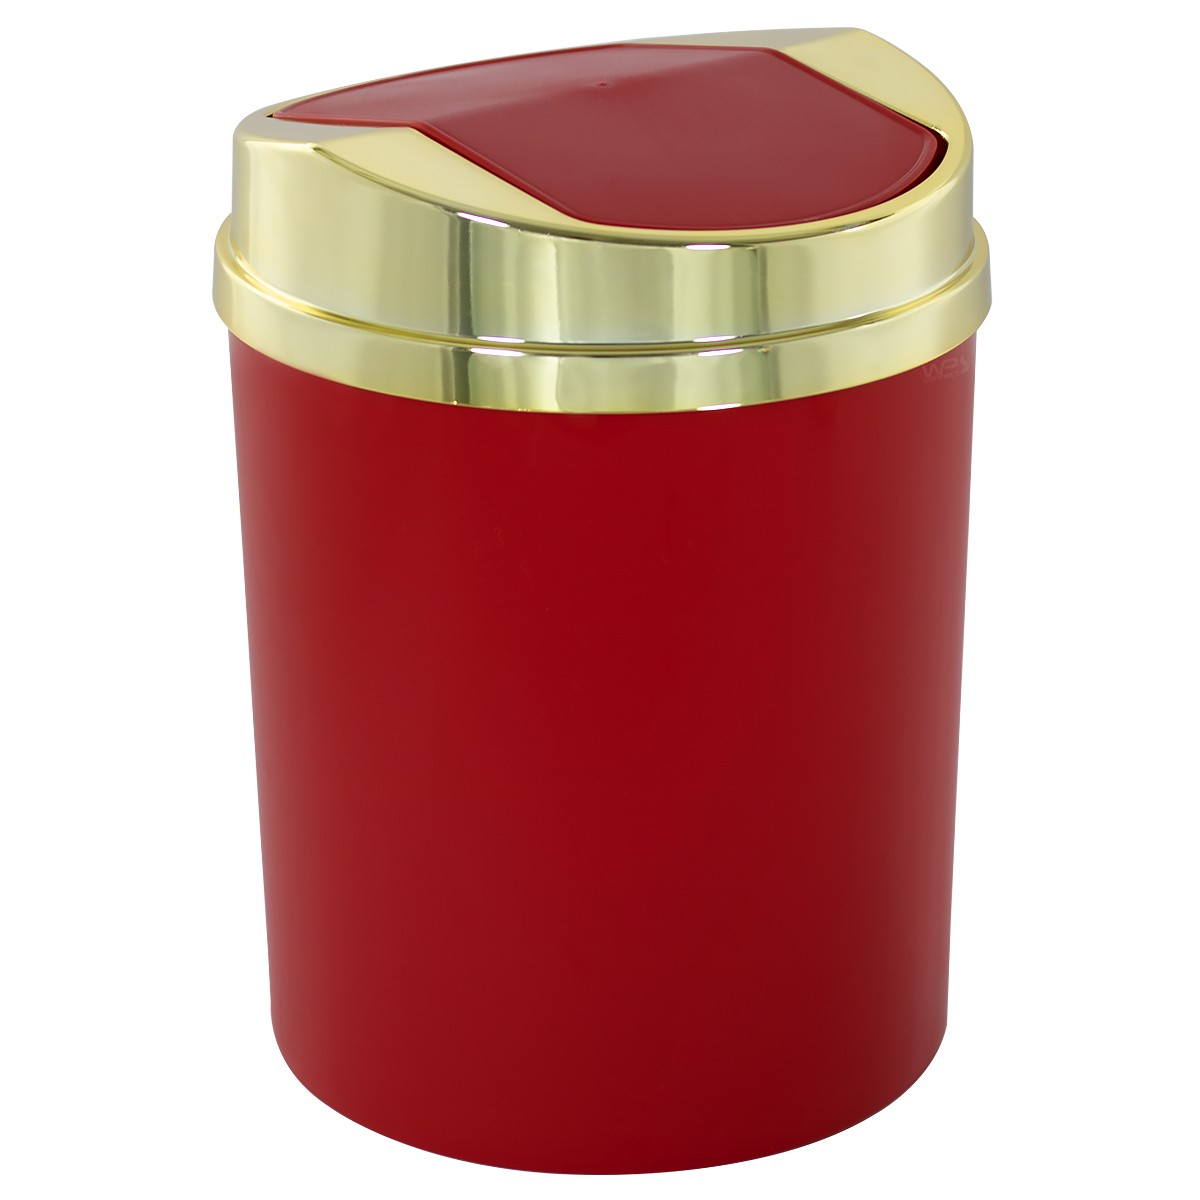 Lixeira Tampa Basculante Dourada 5 litros Cozinha Banheiro